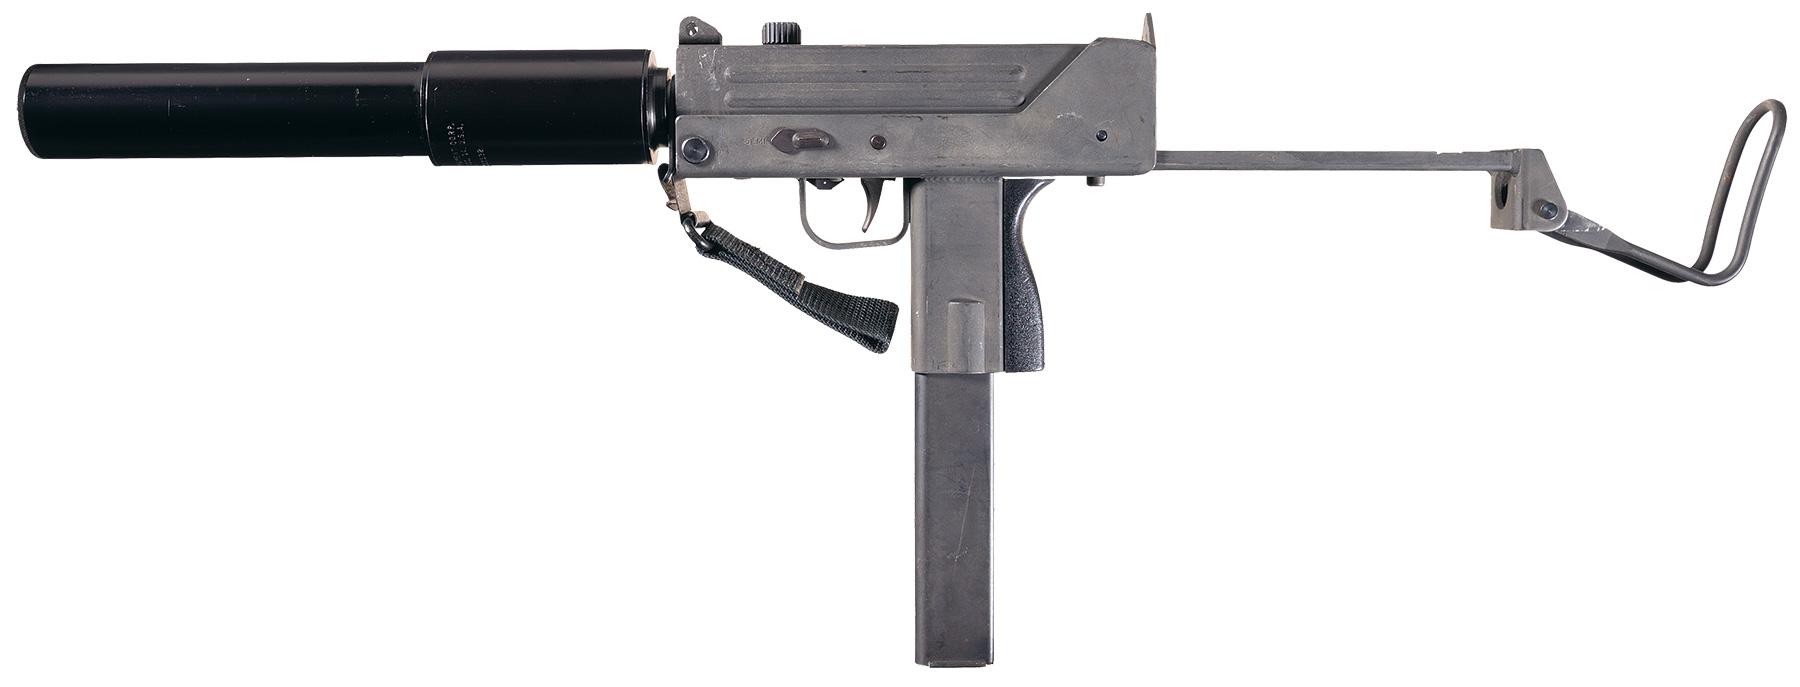 Military Armament Corp  Ingram M10 Sub-Machine Gun with MAC M10